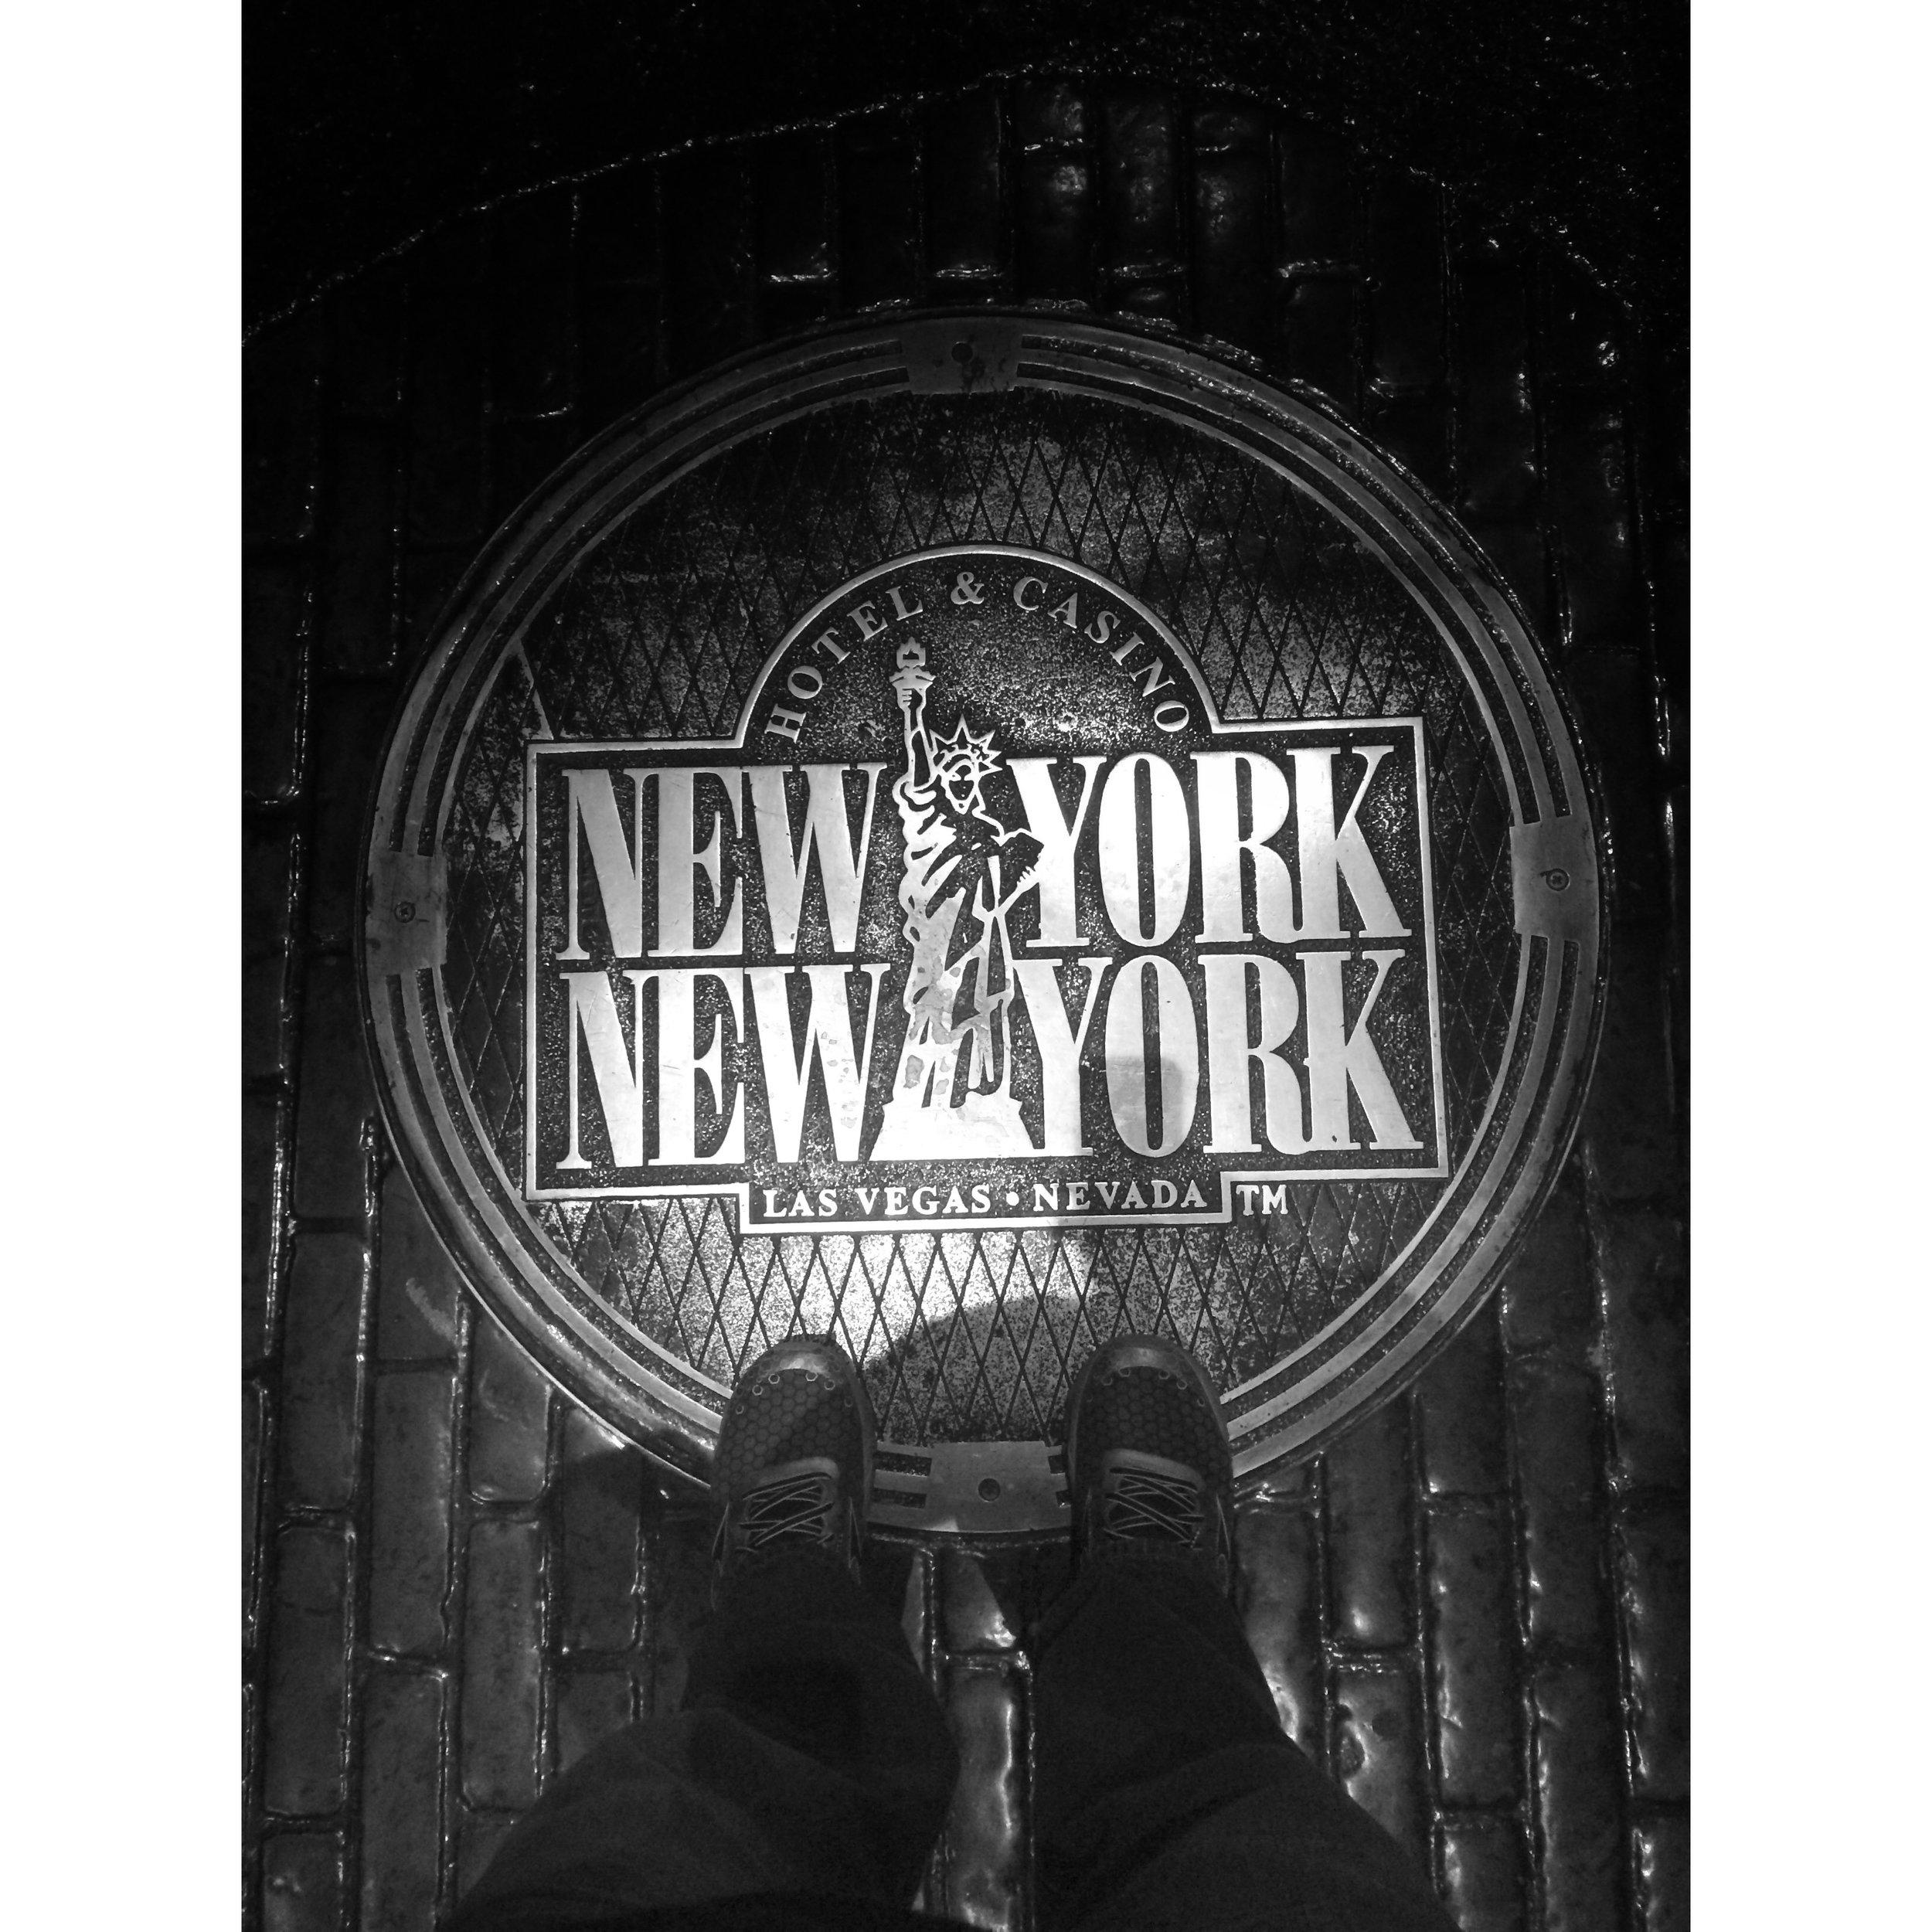 Inside New York New York Hotel - Las Vegas NV